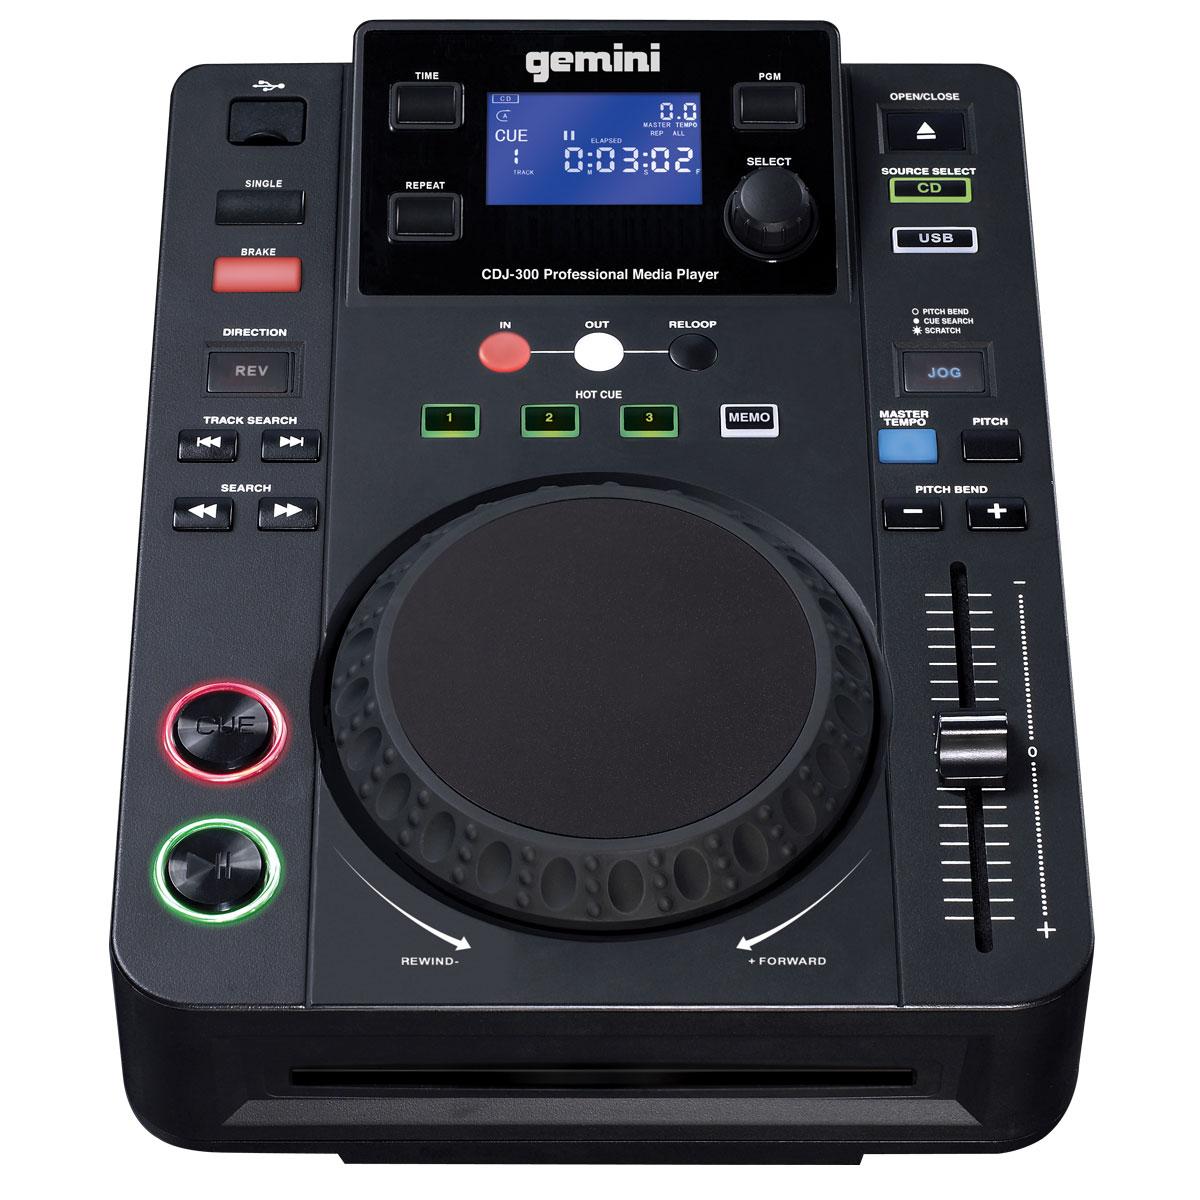 Gemini cdj 300 table de mixage gemini sur - Table de mixage professionnel ...